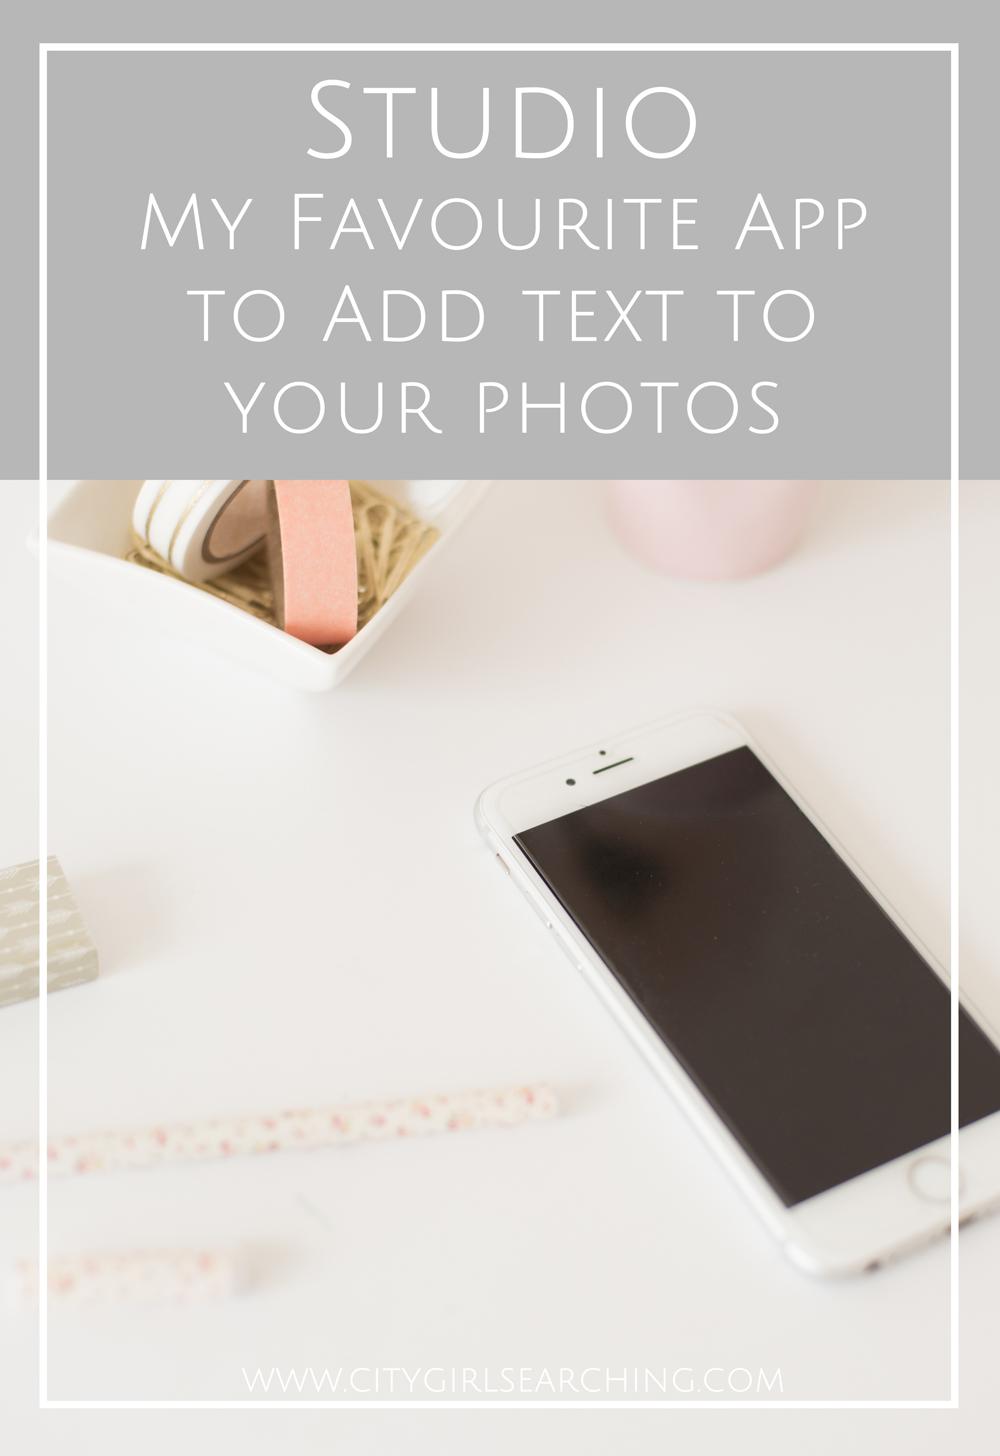 Studio Favourite App to Add Text To Photos